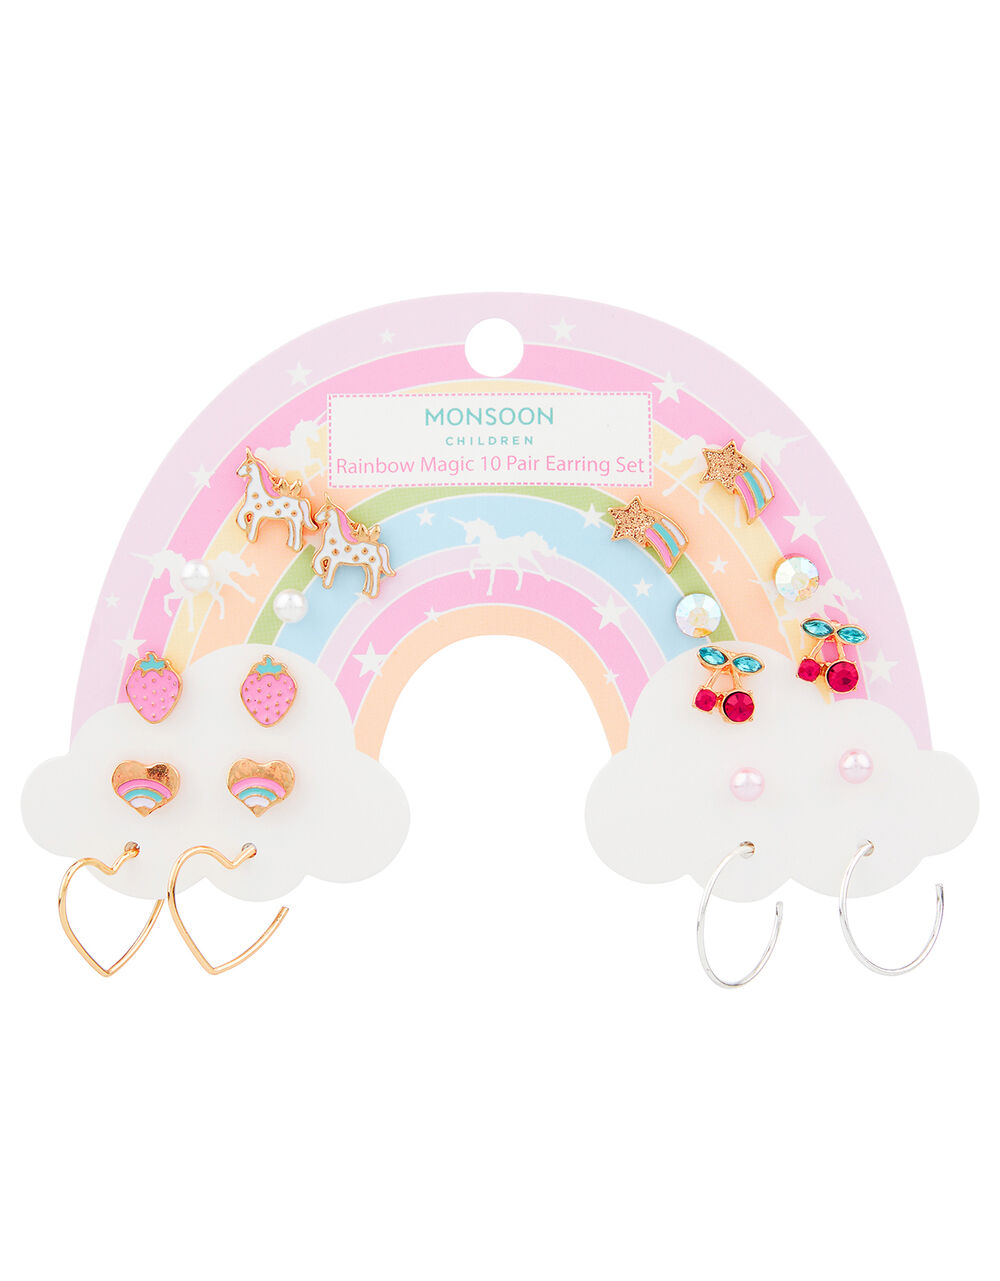 Rainbow Magic Earring Multipack, , large